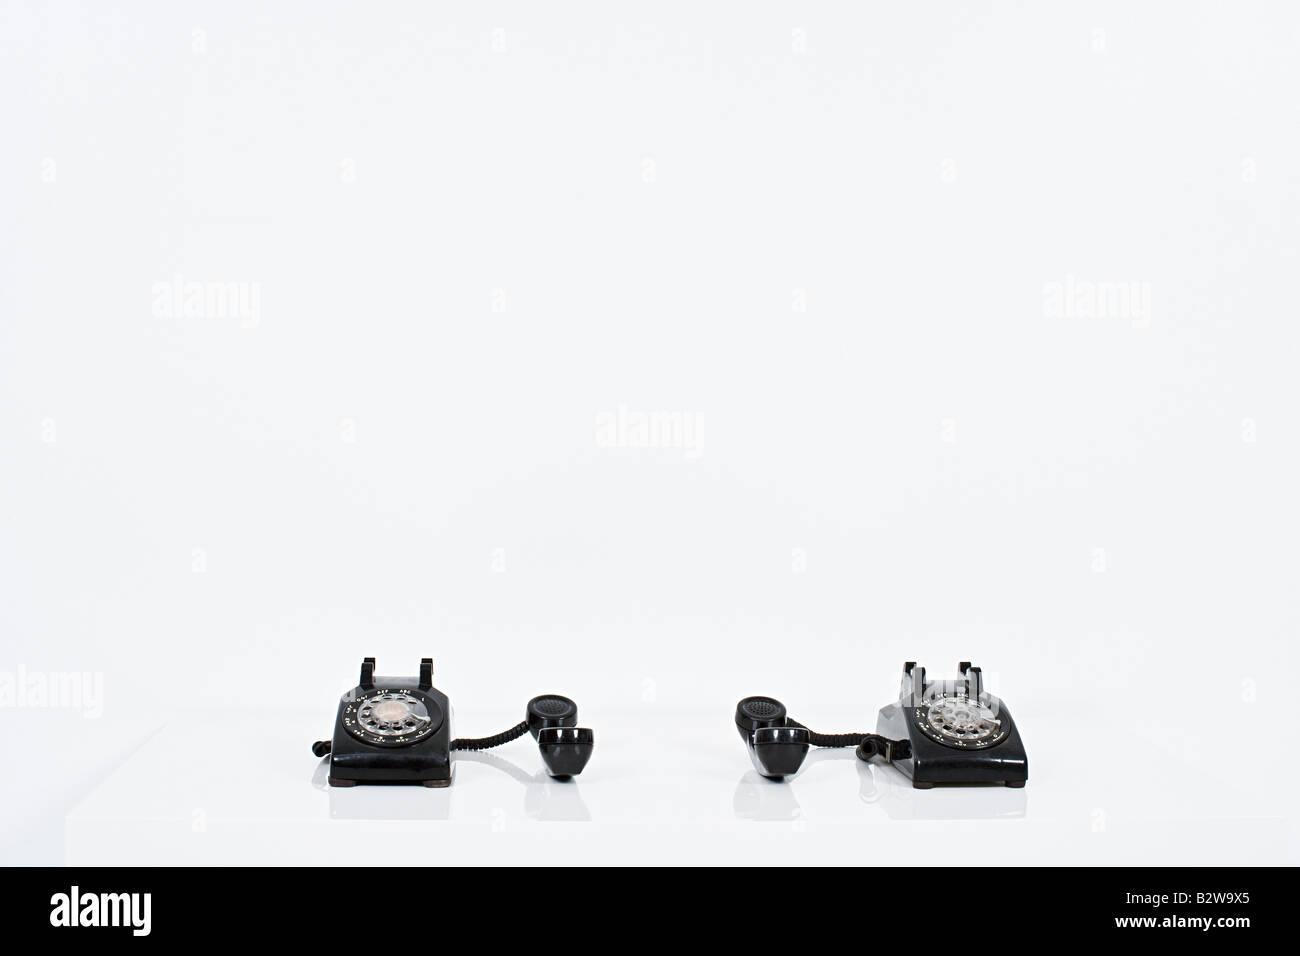 Two telephones - Stock Image